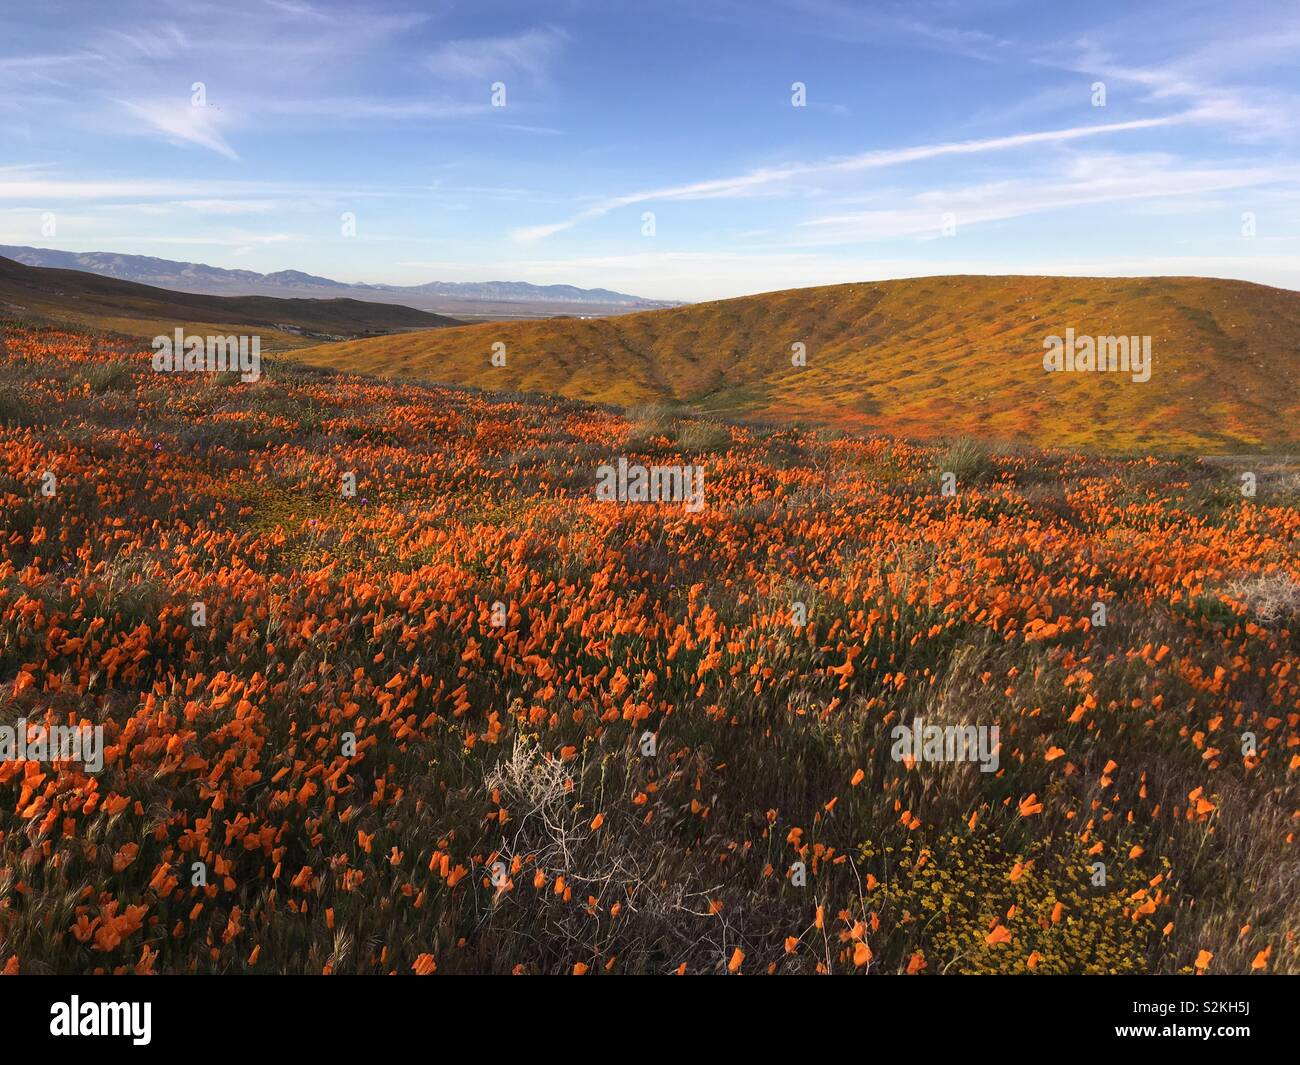 Superbloom in Antelope Valley California Poppy Reserve - Stock Image